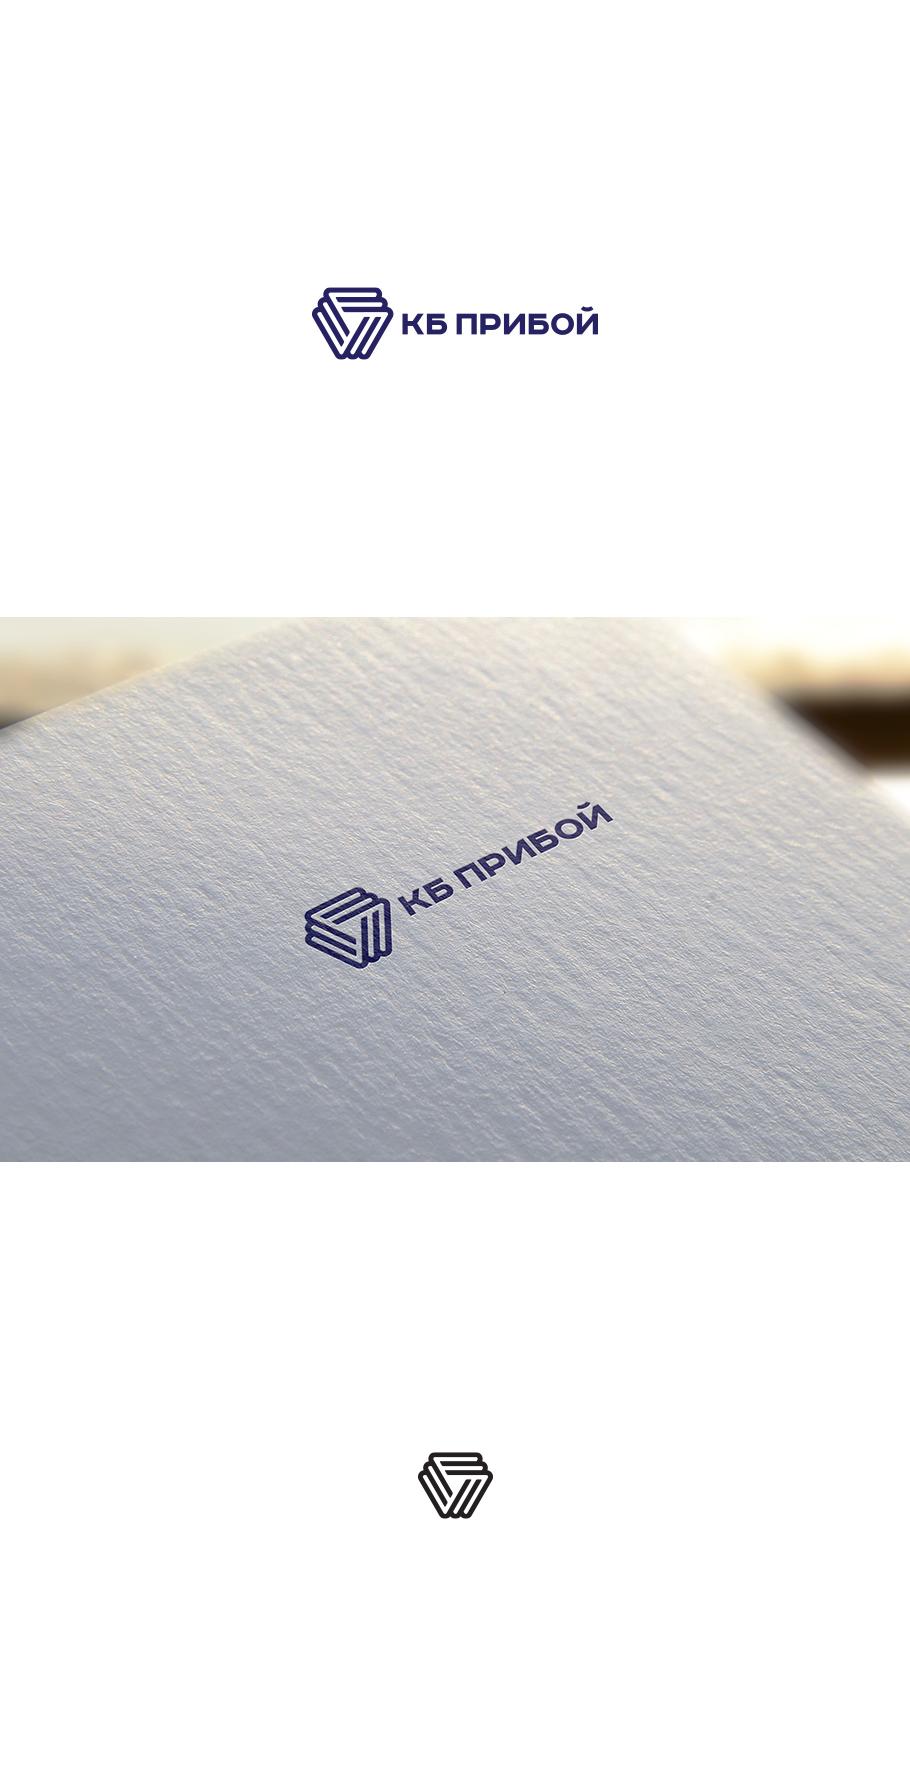 Разработка логотипа и фирменного стиля для КБ Прибой фото f_3855b29b041481e2.jpg